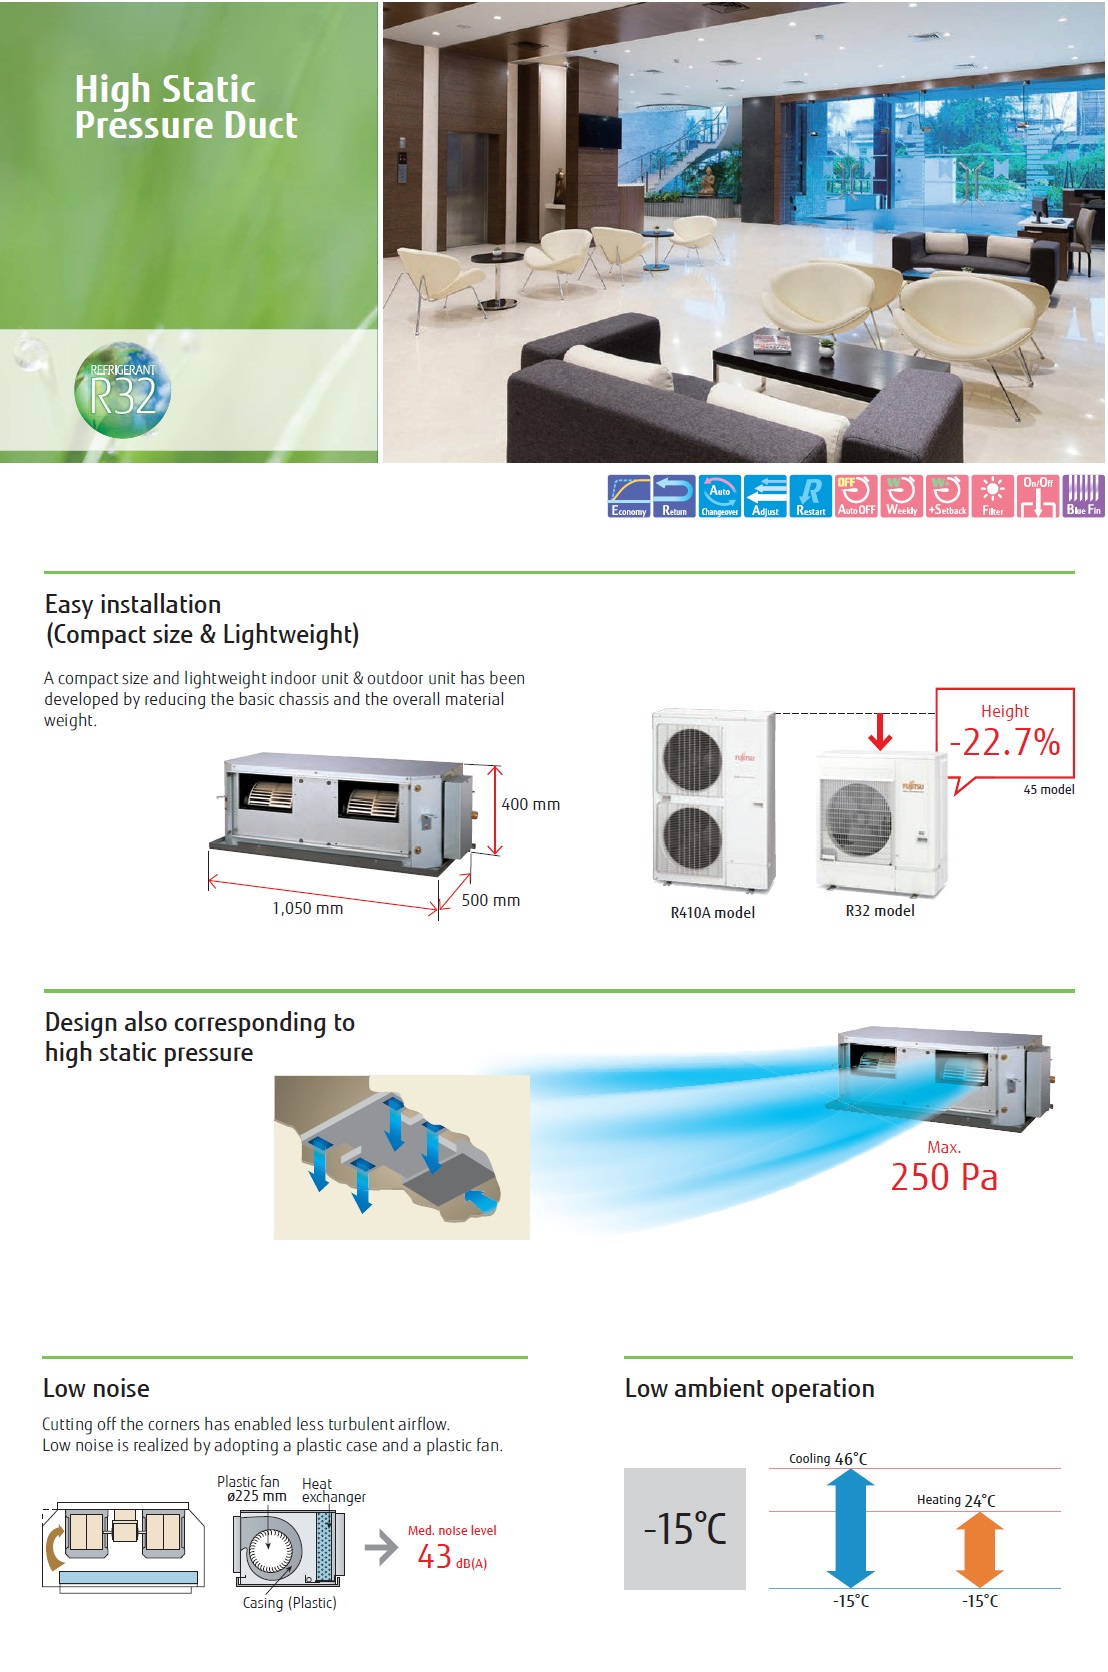 Gewerbeklimaanlagen Fujitsu 54000 Btu ARXG54KHTA+ AOYG54KBTB